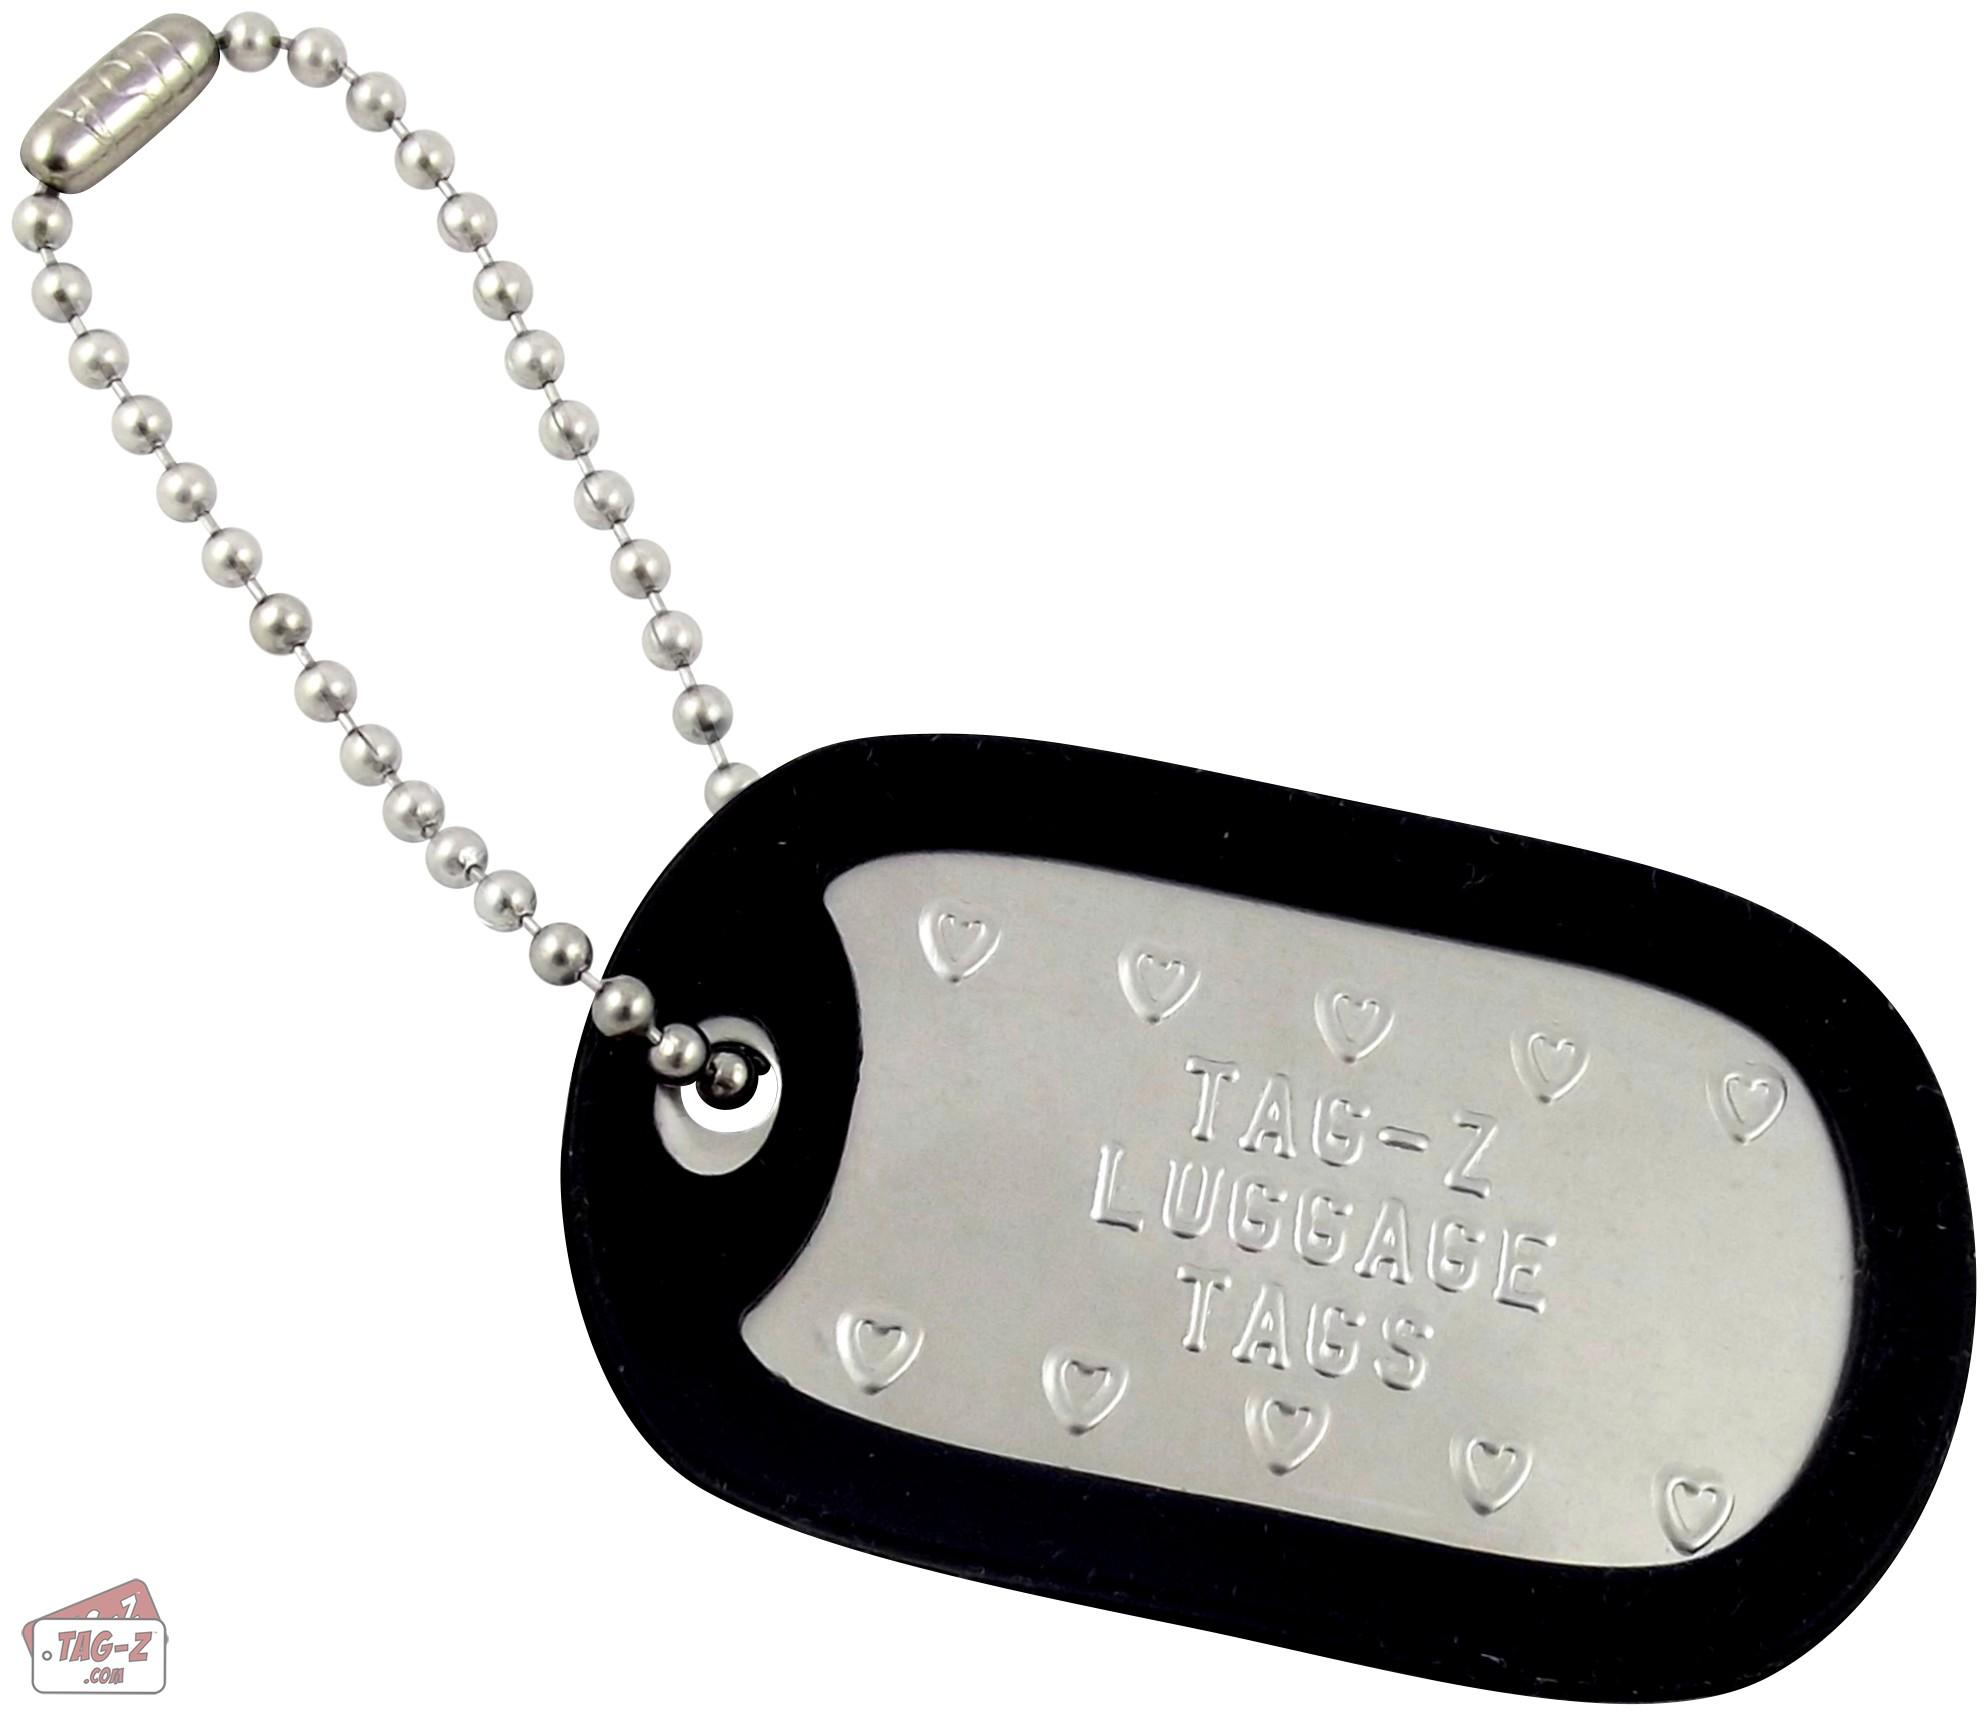 8b3039584b4d Tag-Z Customized Luggage Tags - Military Dog Tag Luggage Tags